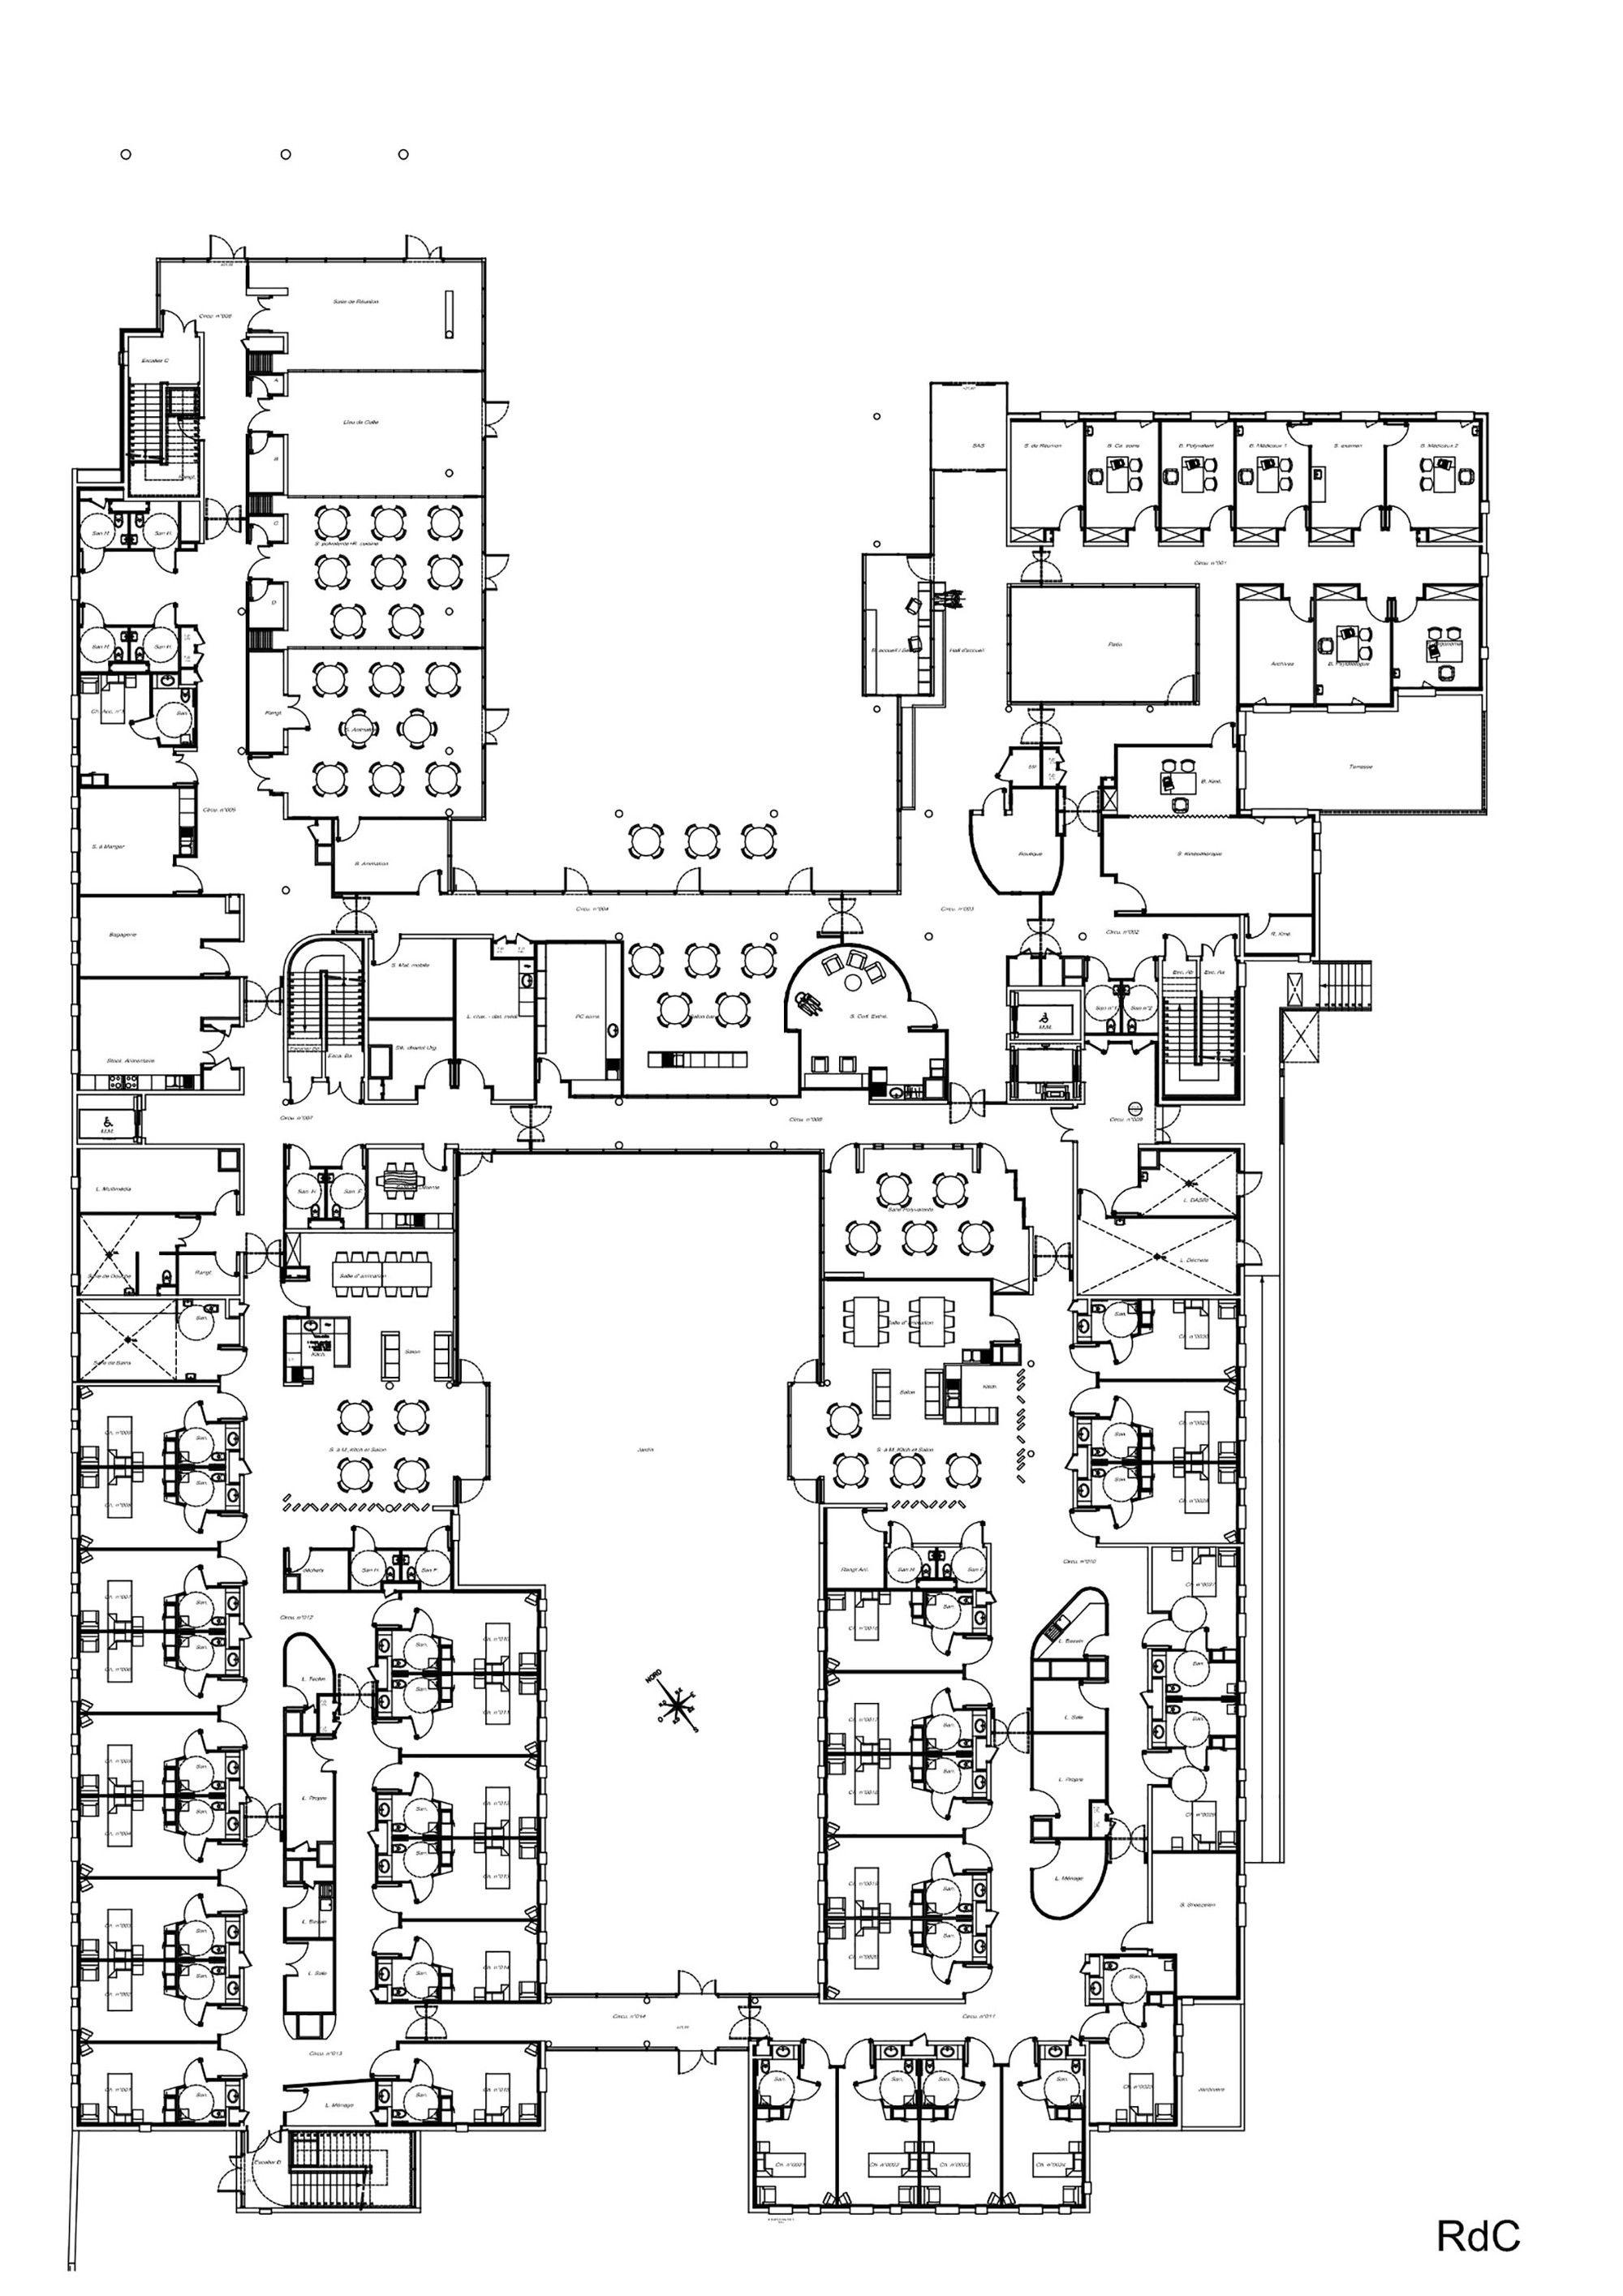 Gallery Of Establishment For Dependent Elderly Parallele 16 Home Design Floor Plans Floor Plan Design Hospital Floor Plan